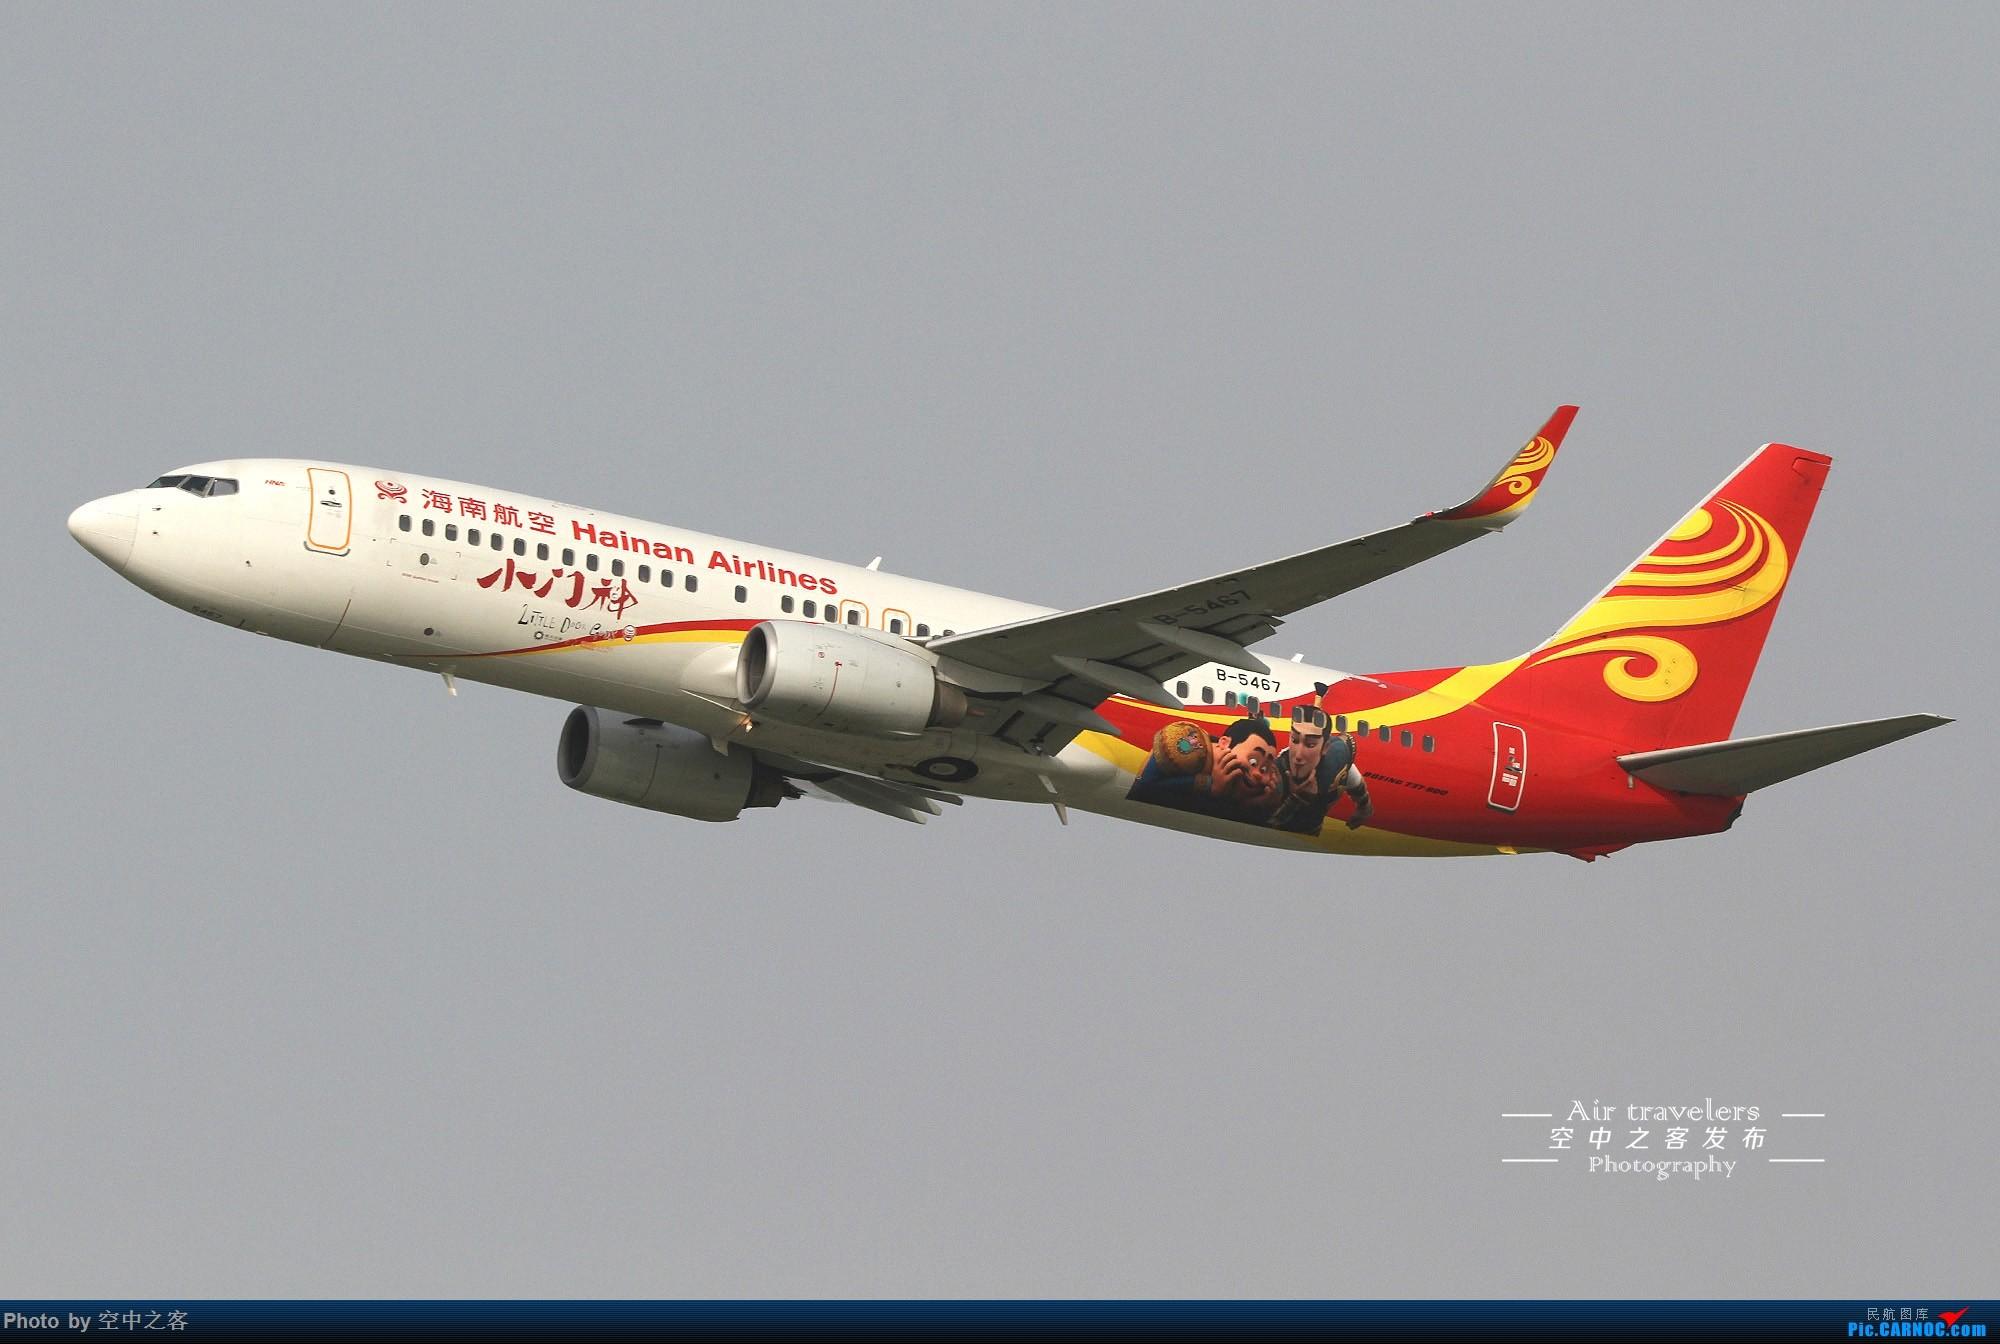 Re:[原创][合肥飞友会-霸都打机队 空中之客发布]解锁两只HU家的小彩绘+首航蓝鼻头~ BOEING 737-800 B-5467 合肥新桥国际机场